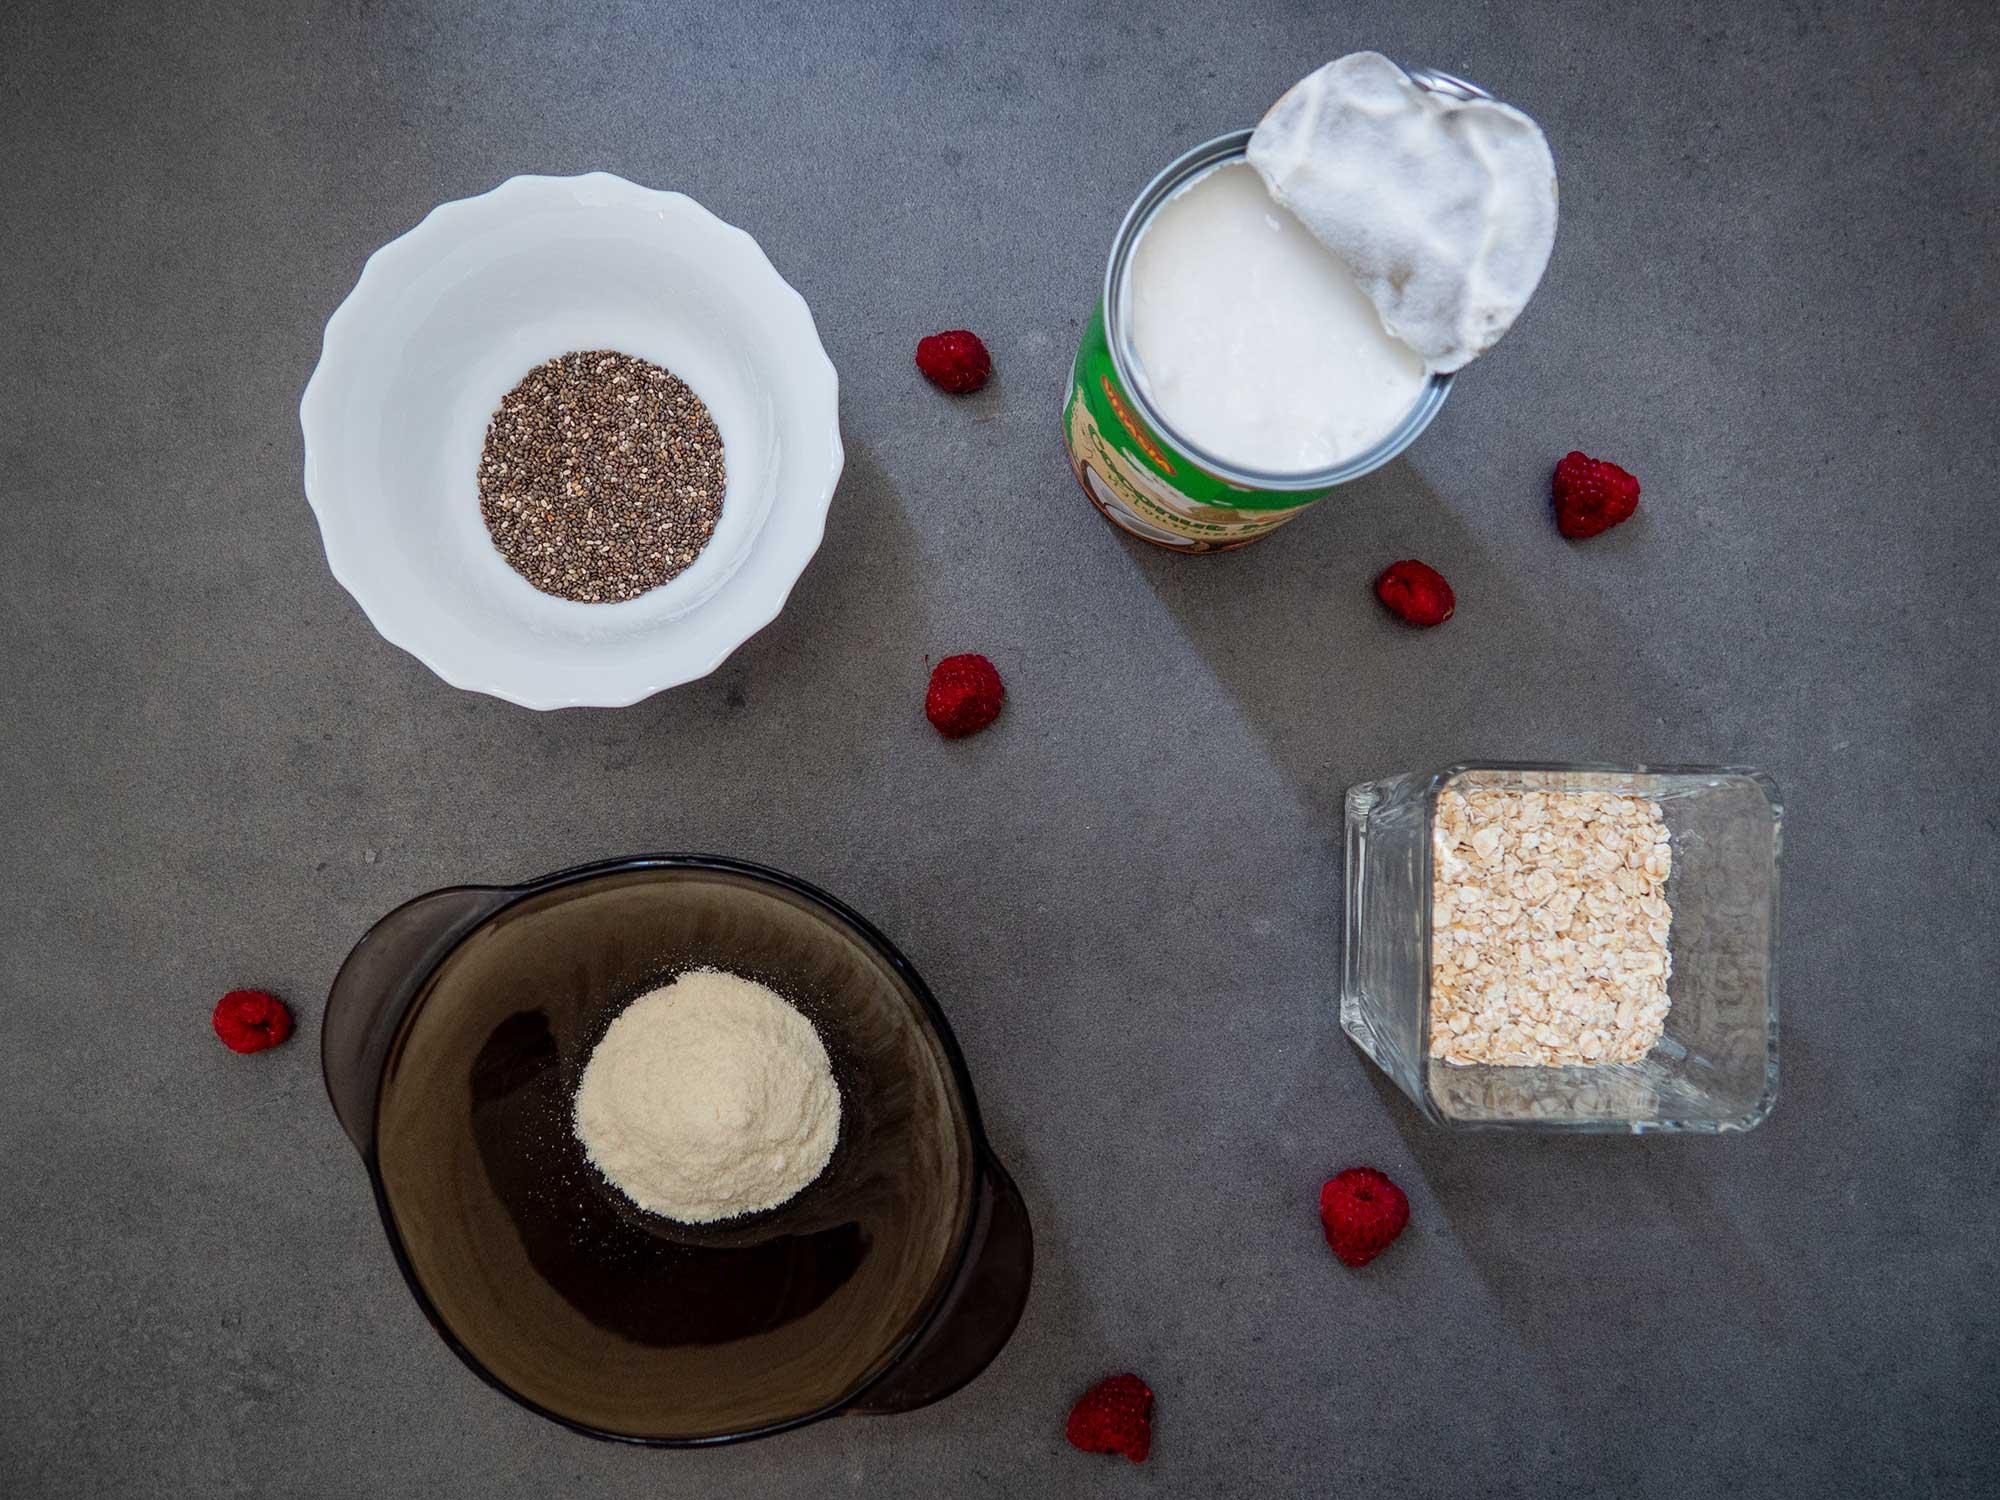 Oat Flakes, coconut milk, chia seeds